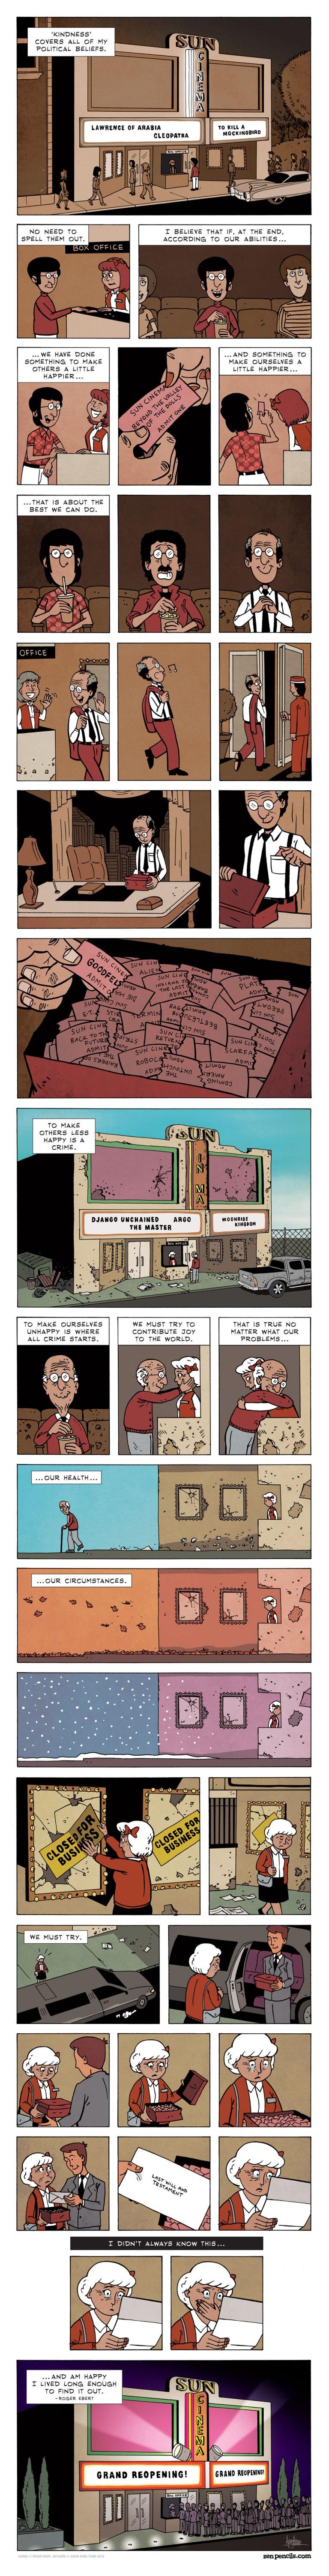 Roger Ebert on Kindness - Cartoon Quote